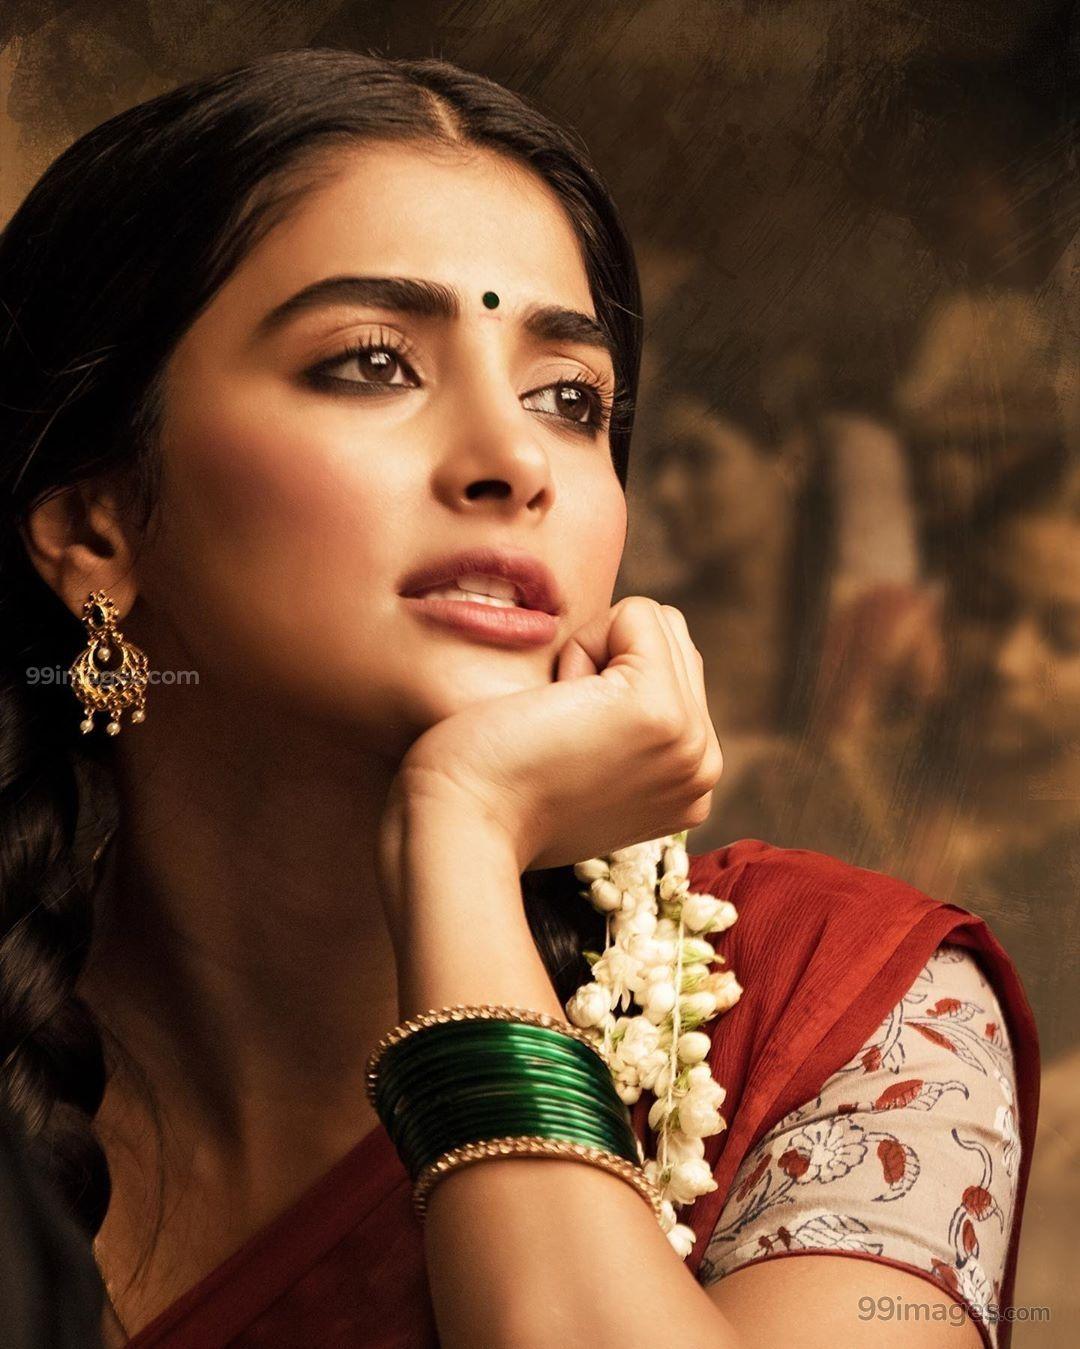 Beautiful Bollywood Actress Hd Wallpapers 1920x1080